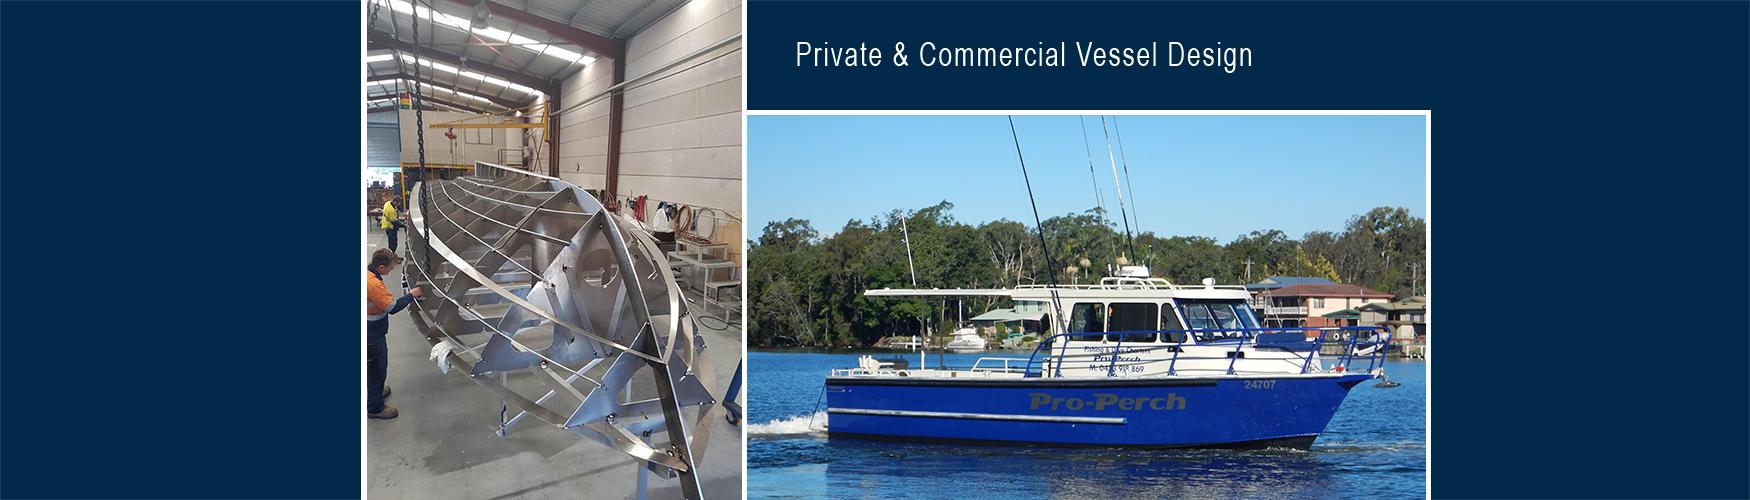 Boat & Seatamer Design